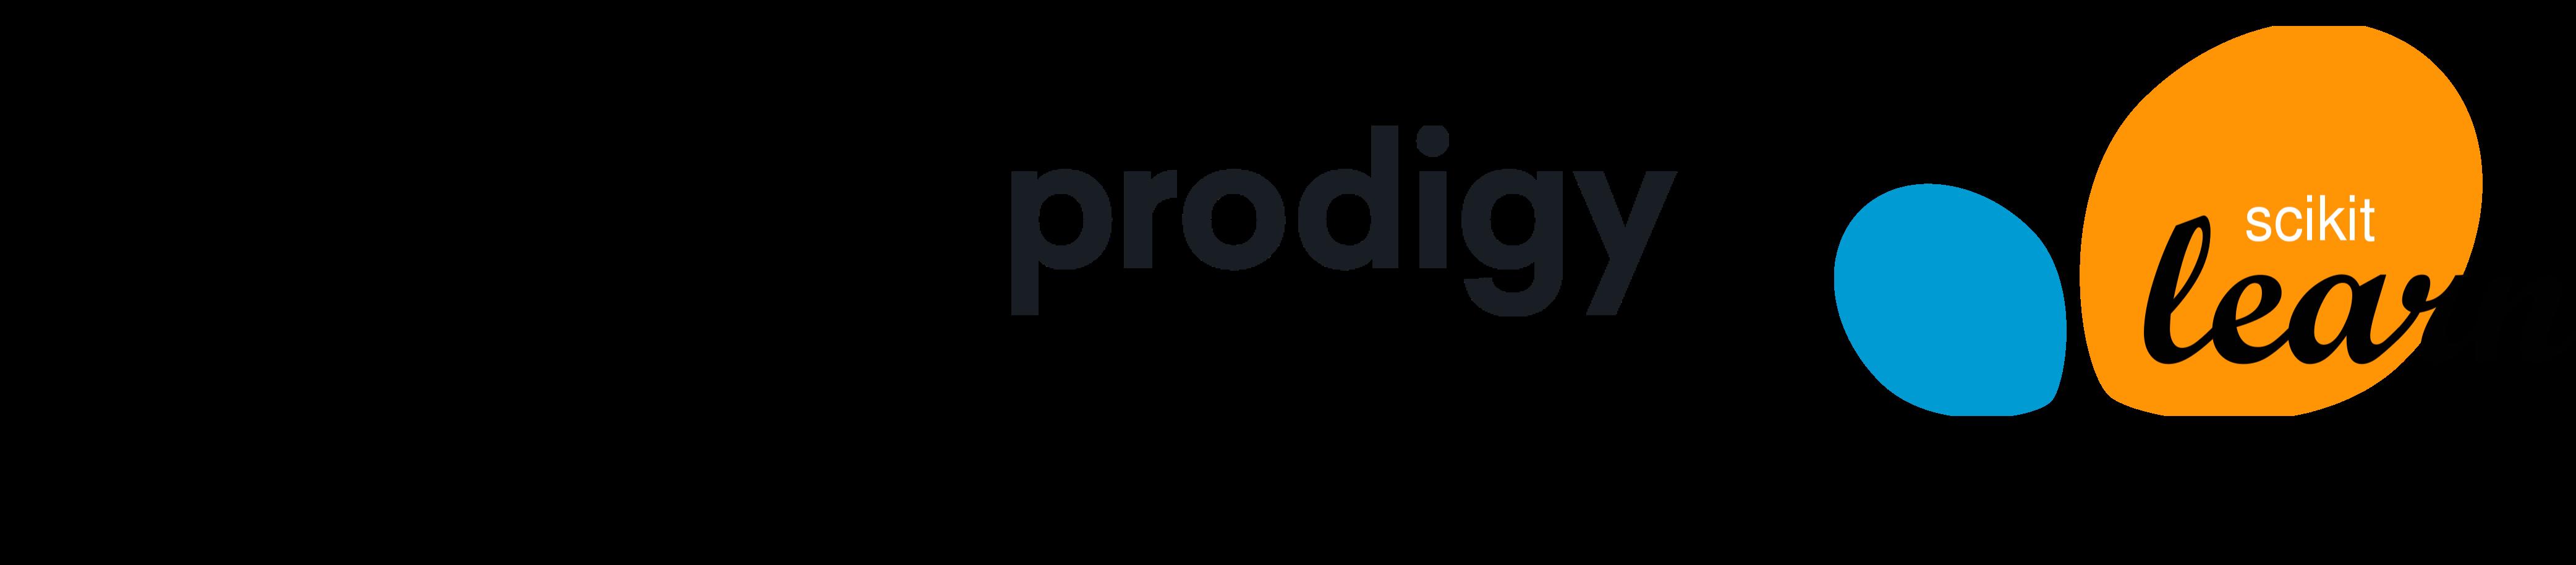 /img/activelearning/logos-1.png